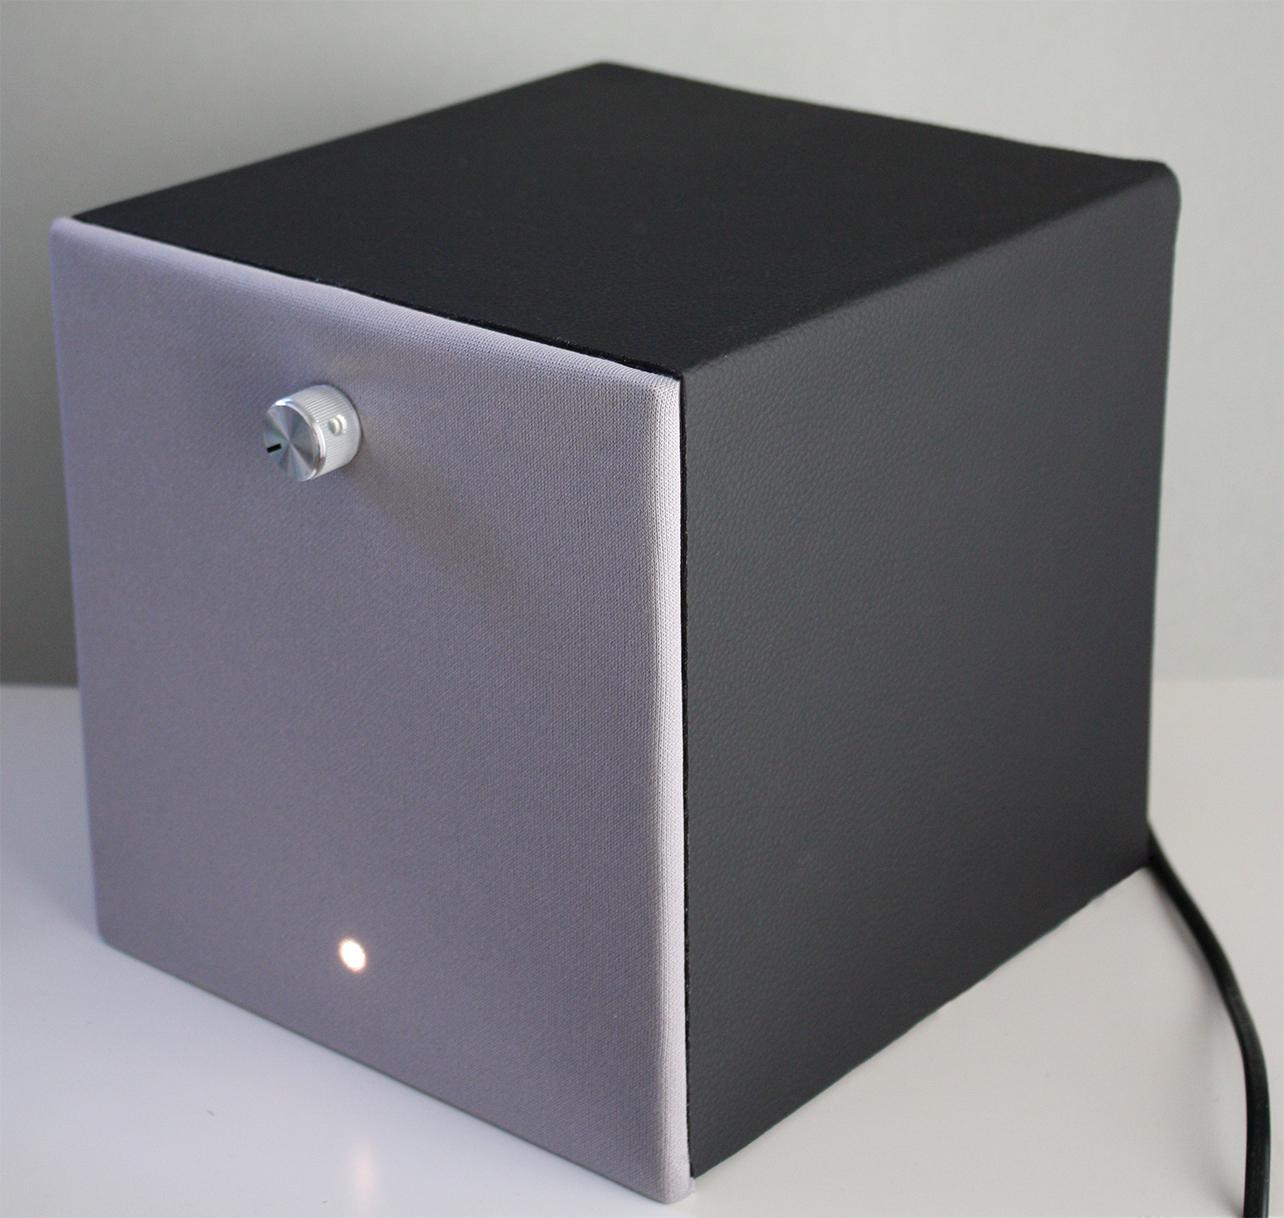 raspbAIRy - the RaspberryPi-based Airplay speaker